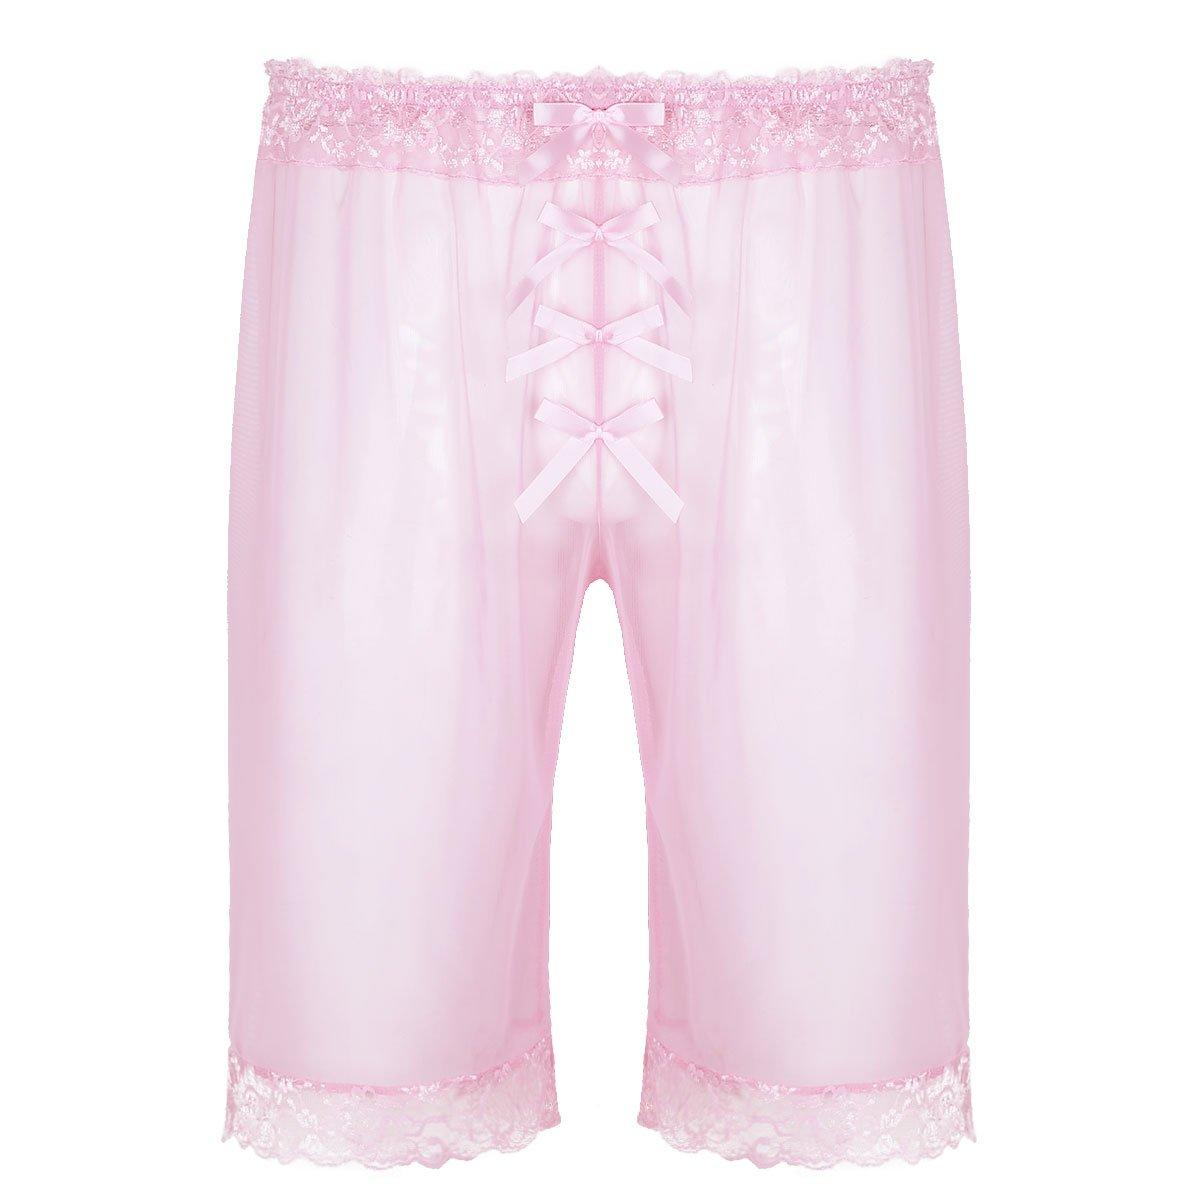 Alvivi Mens See Through Lingerie Sissy Sheer Mesh Lace Bowknot Loose Shorts Pants Underwear